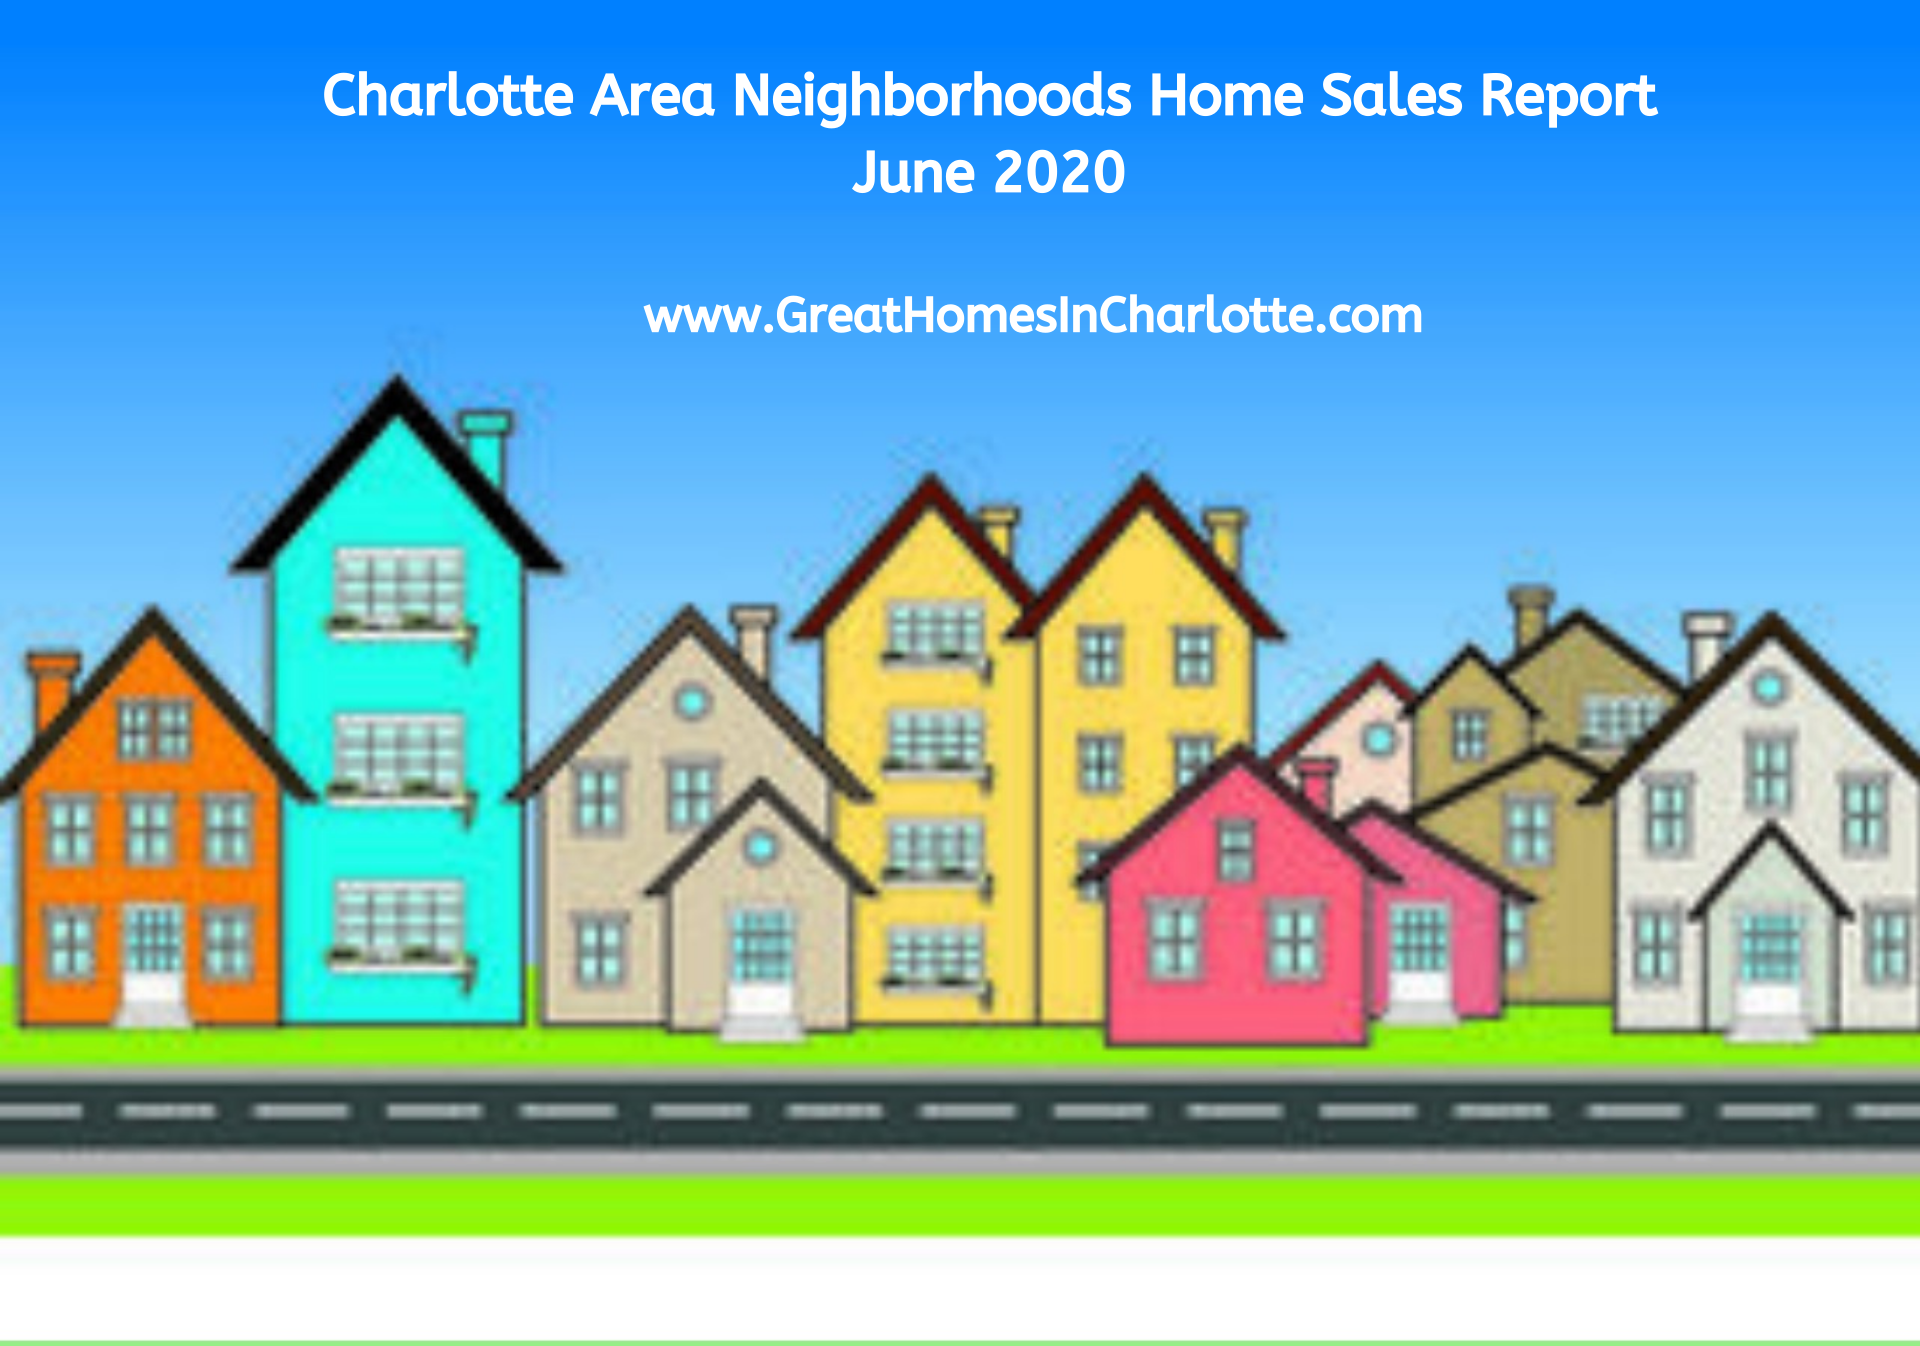 Hottest Selling Charlotte Area Neighborhoods In June 2020